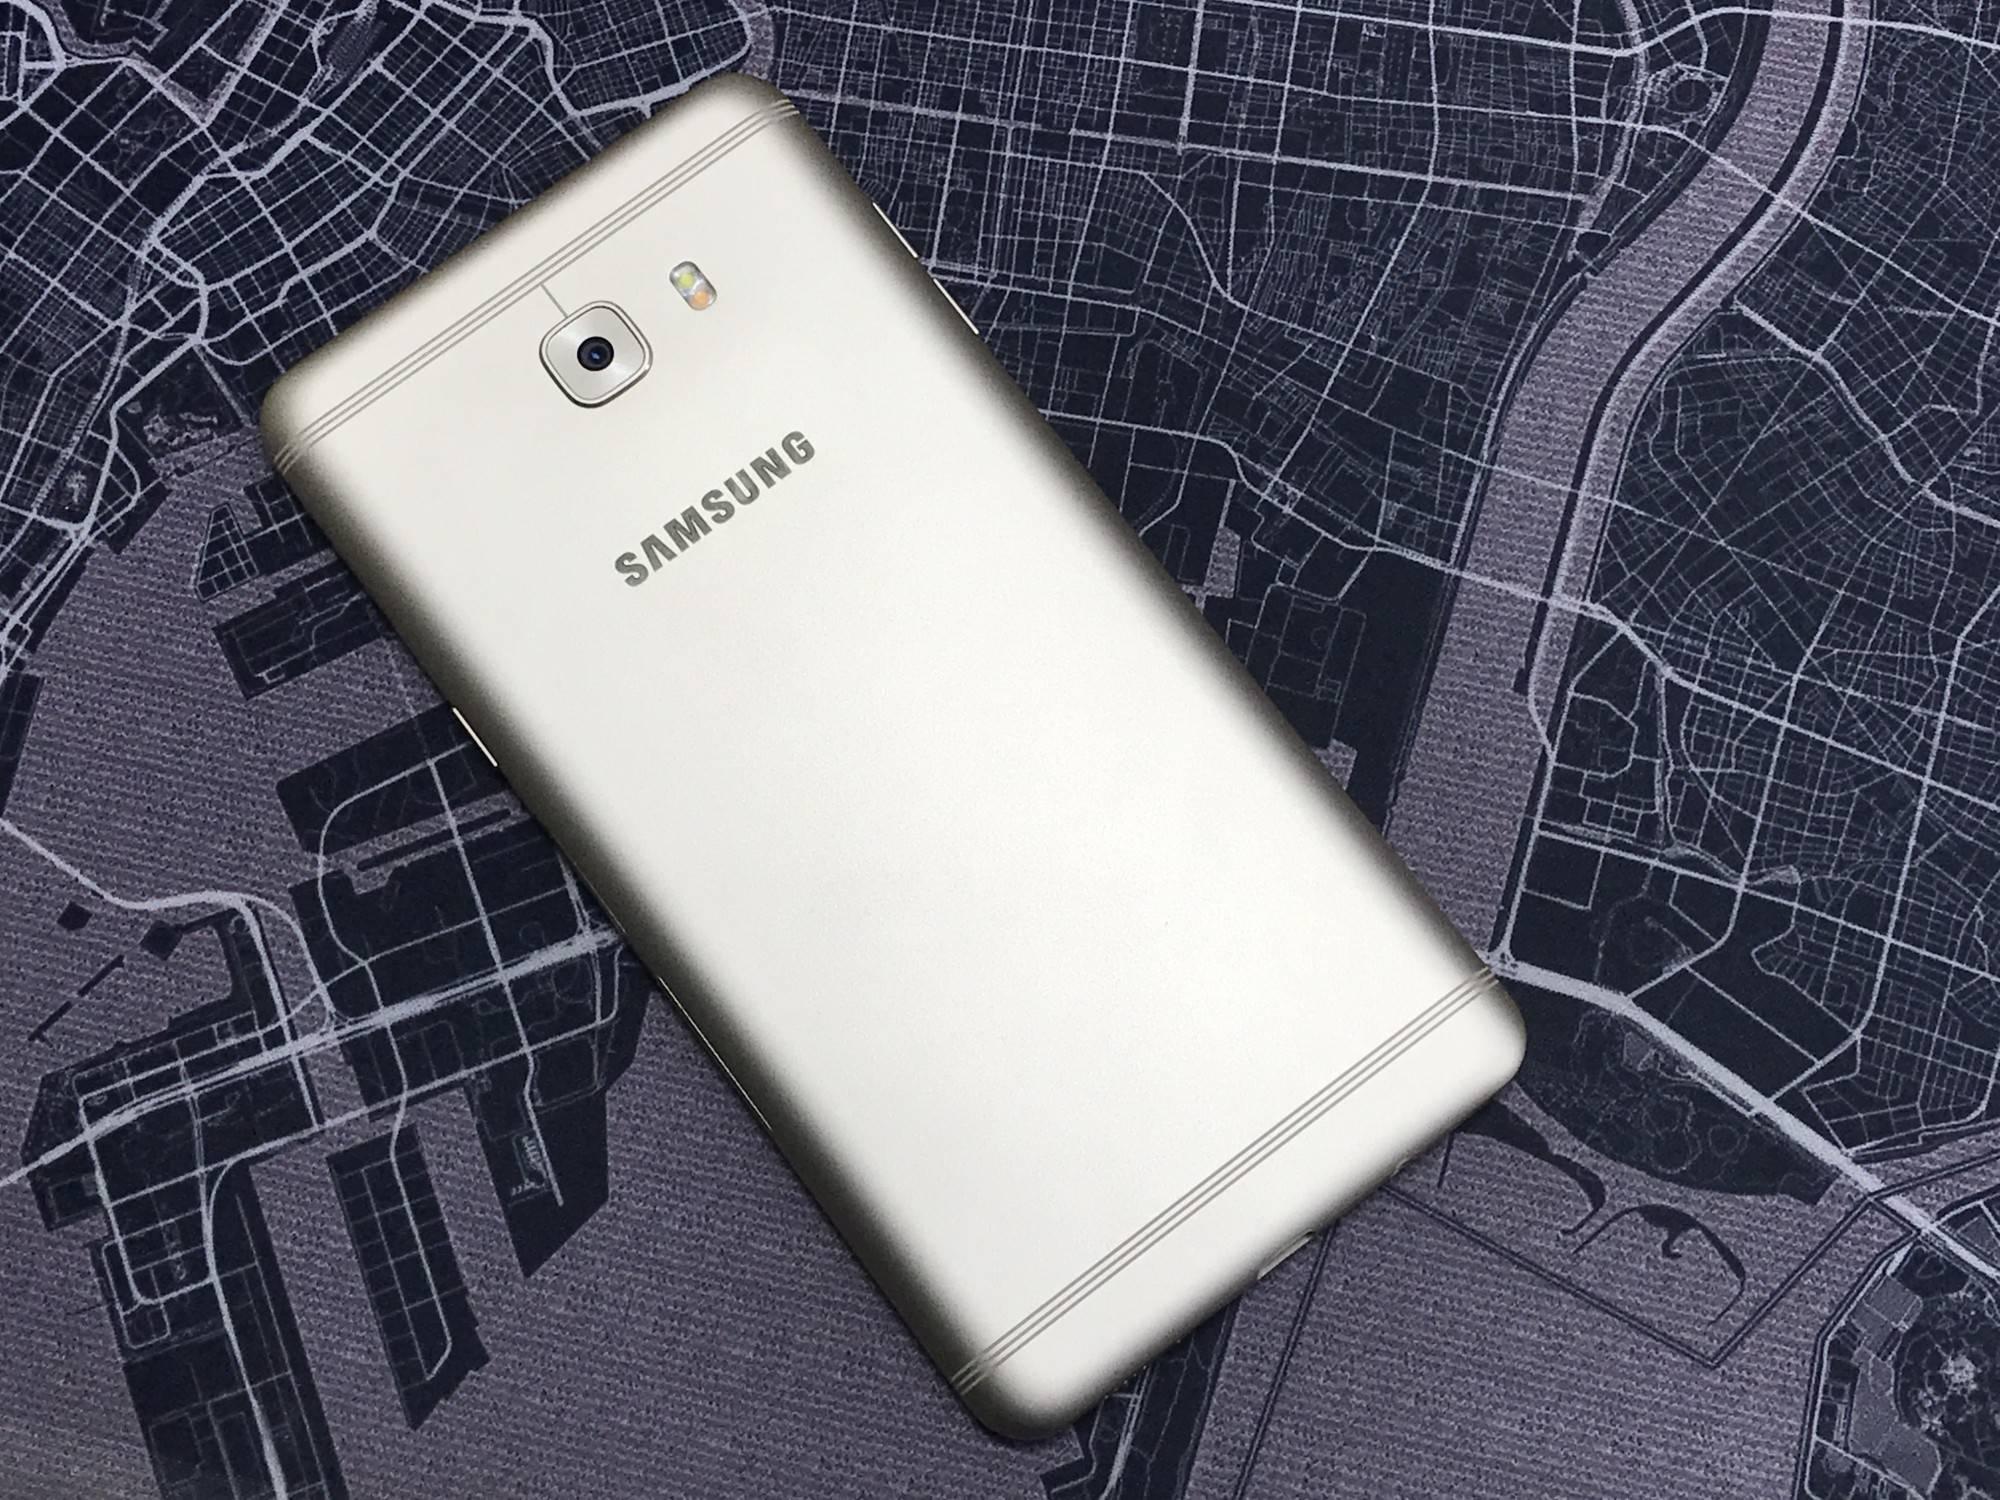 Samsung Galaxy C9 Pro Photo by Hao Ying 3